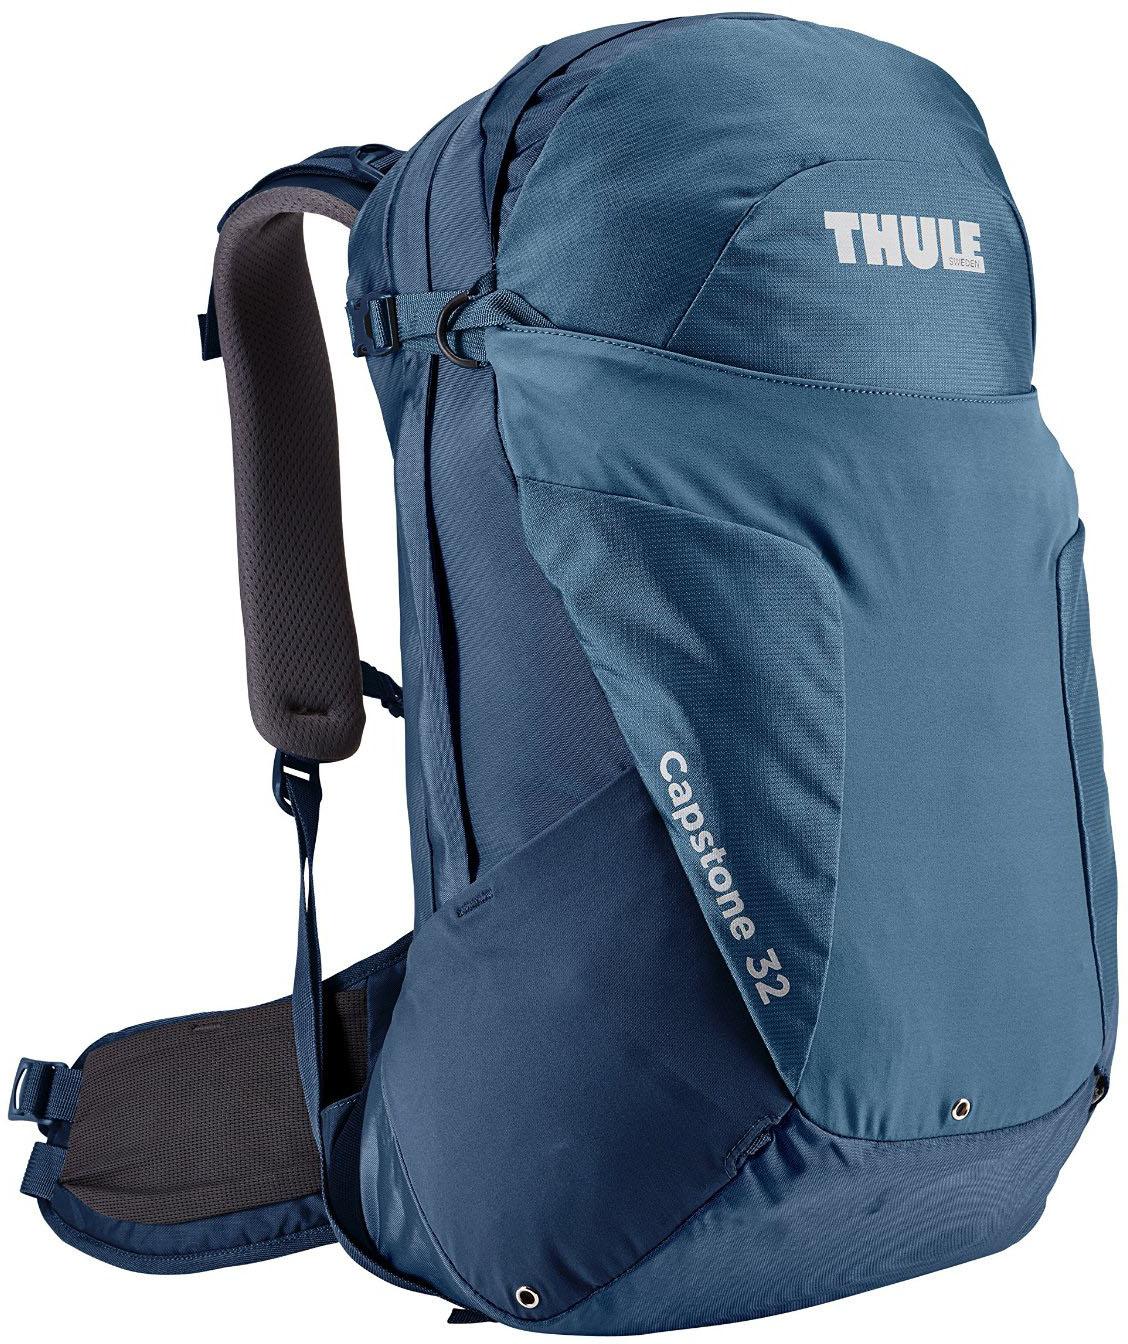 Mens Hiking PackСпортивные рюкзаки<br>Треккинговый рюкзак<br>